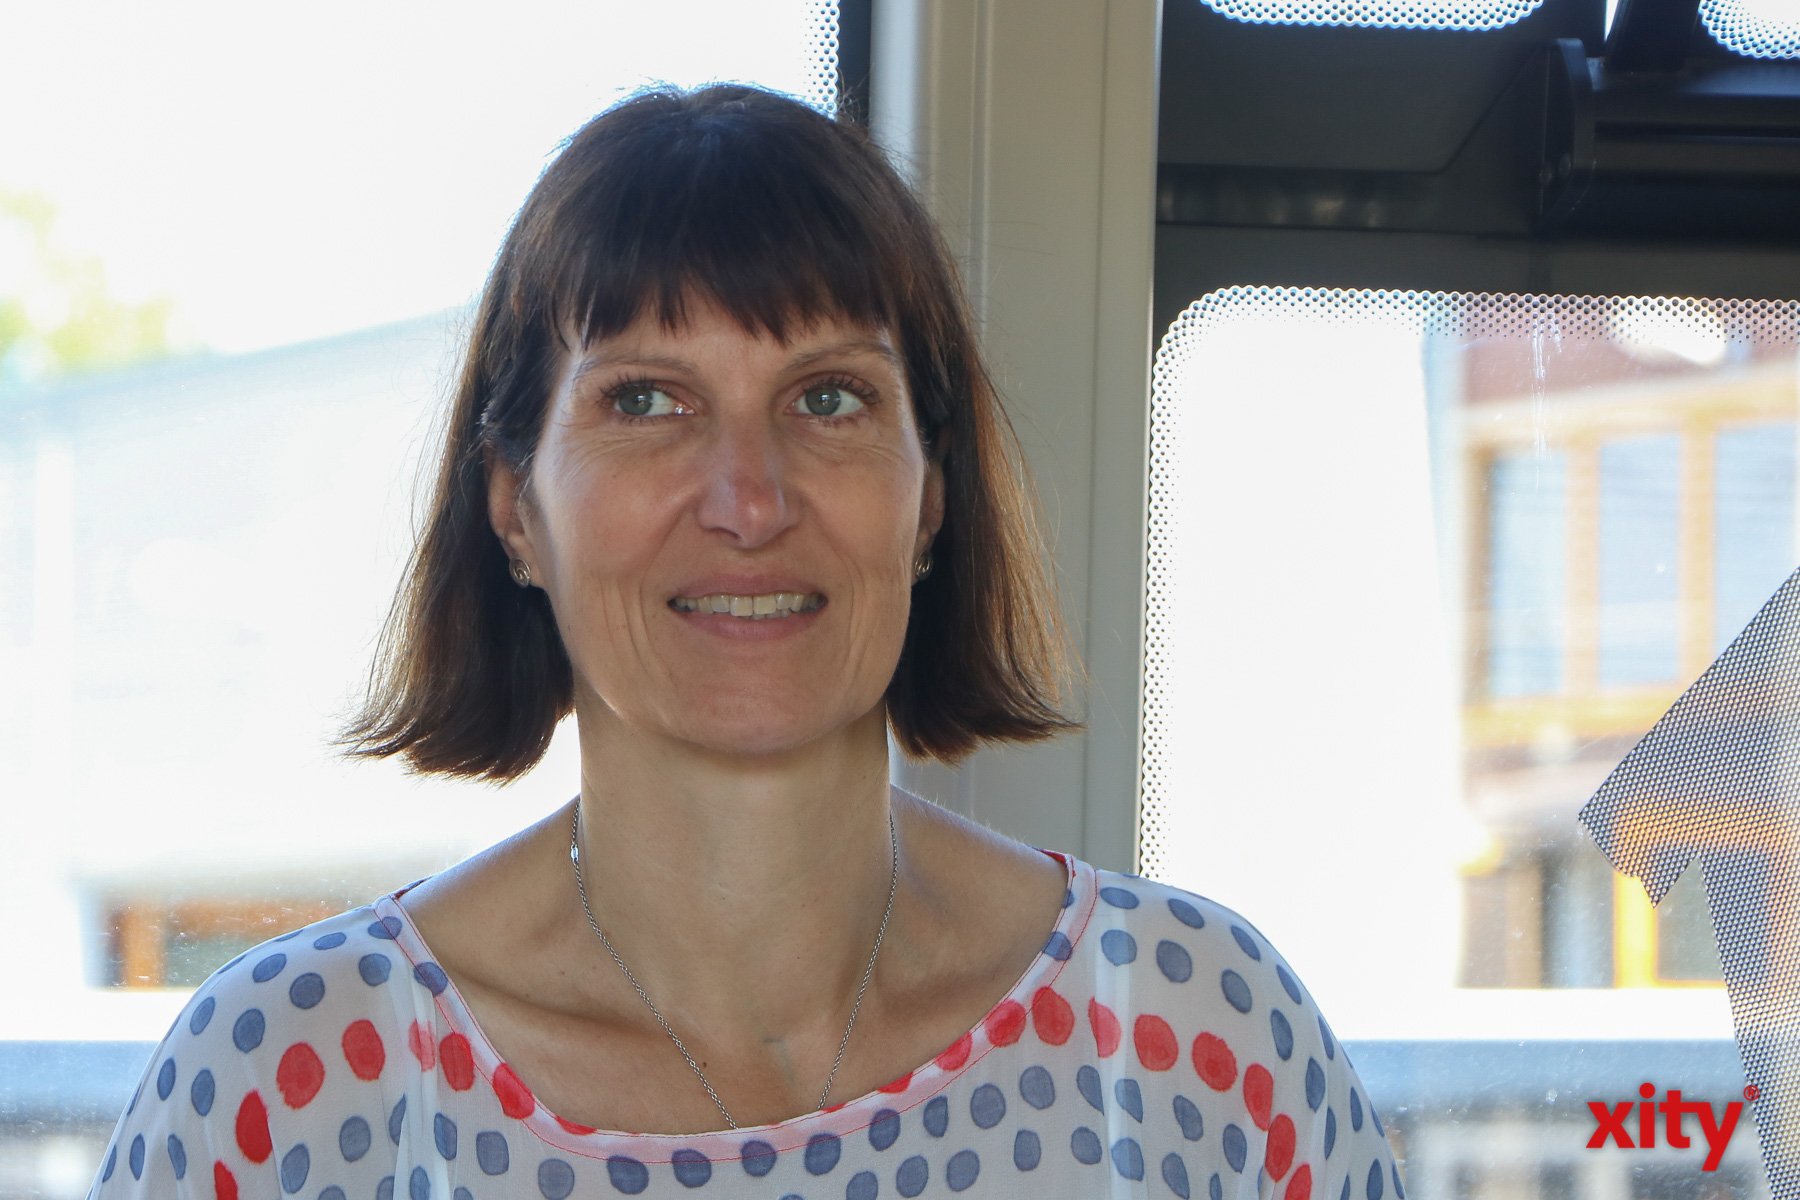 Birgit Alkenings, Bürgermeisterin der Stadt Hilden (Foto: xity)